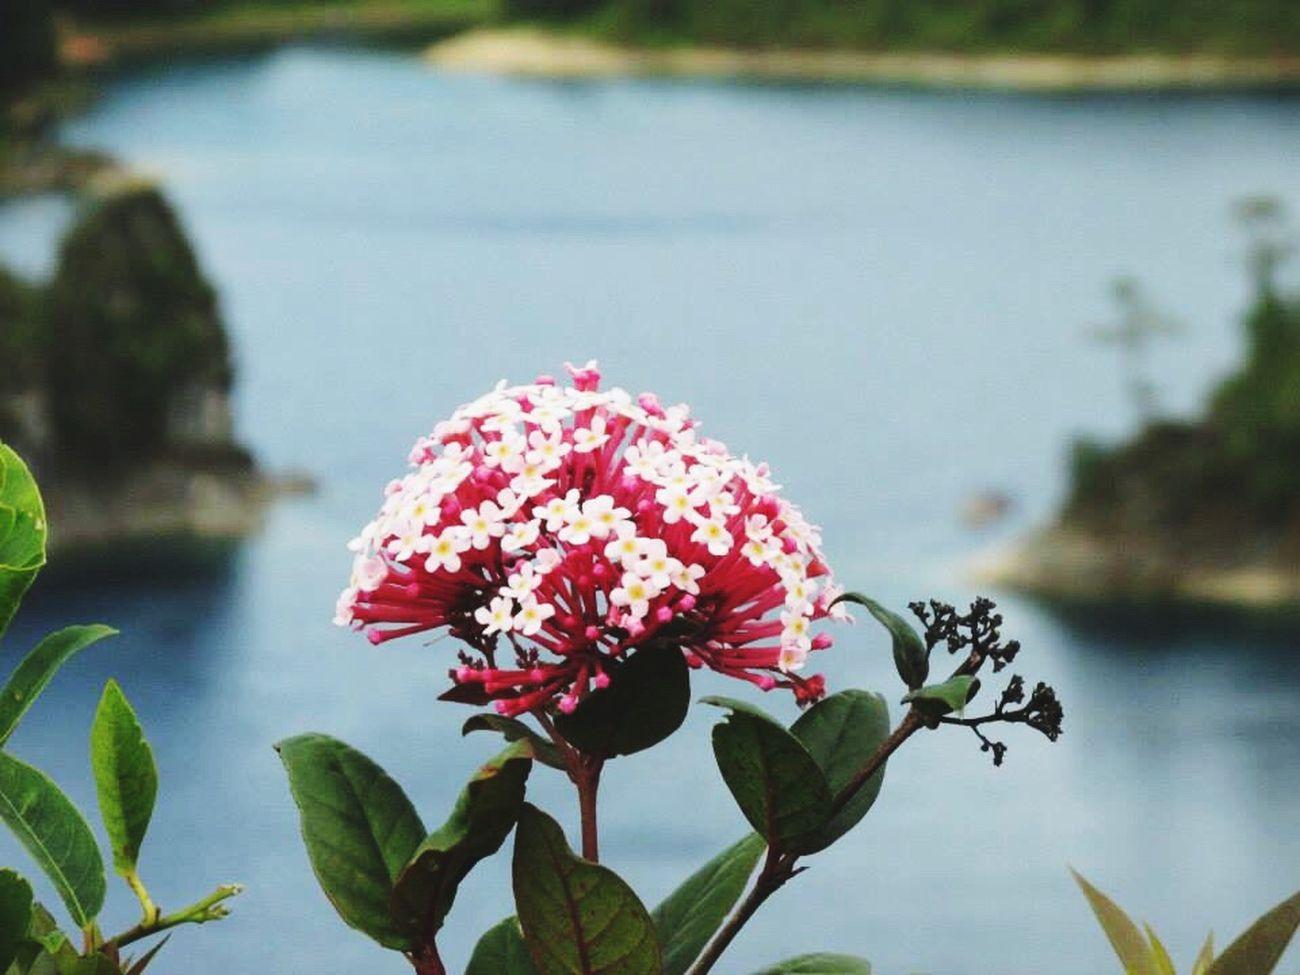 Lagunas de Montebello, Chiapas 2015,México Chiapas Green Awesome Nature Live Mexico Travel Incredible Happiness Vianeycarre Free Blue Water Flower Sky